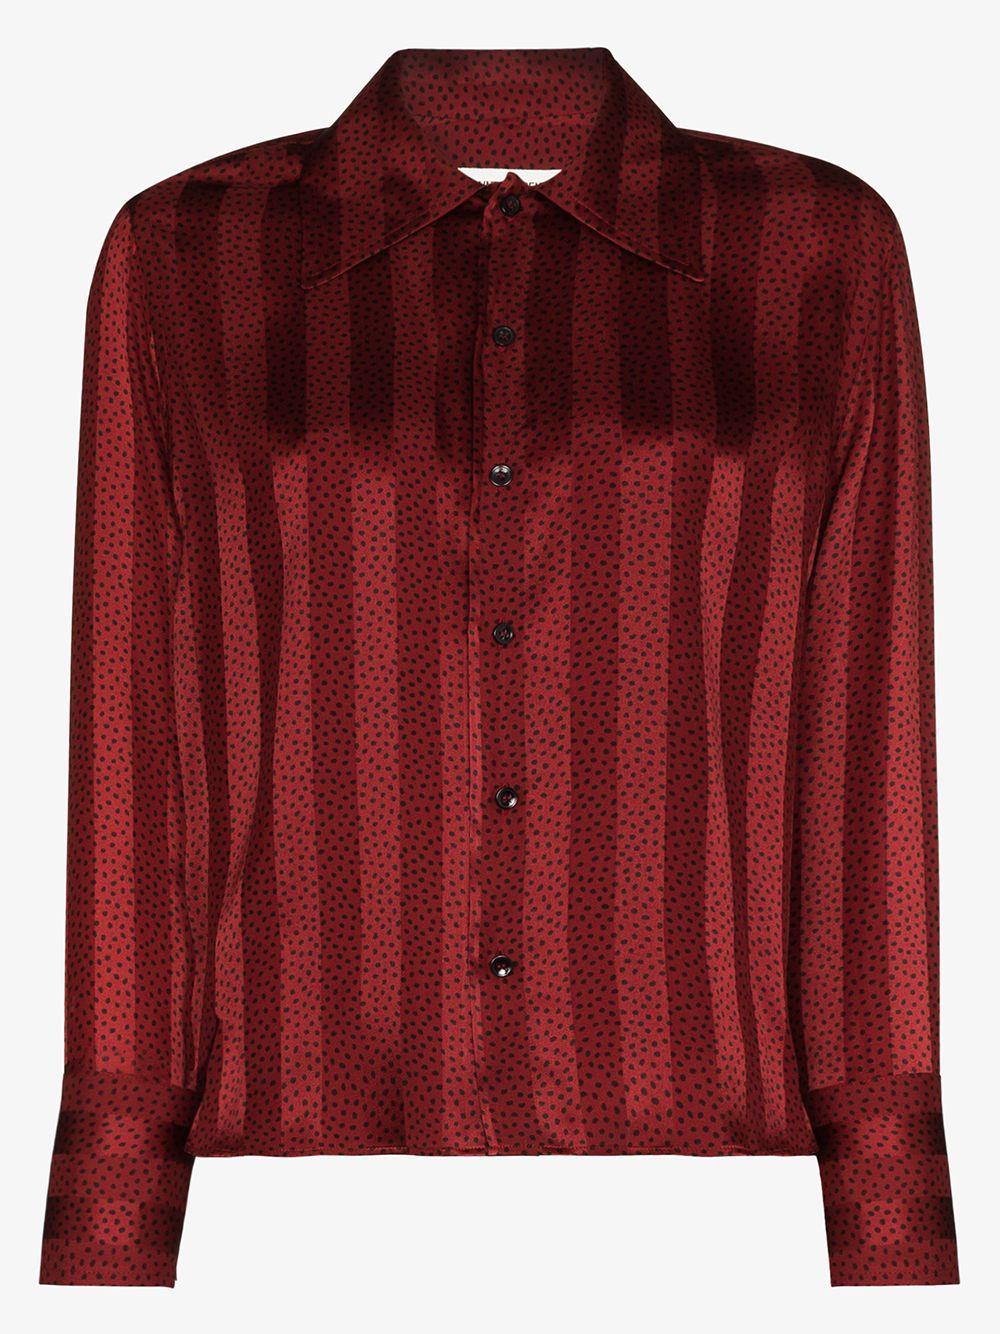 Classic Striped Shirt Item # 626928Y3B27